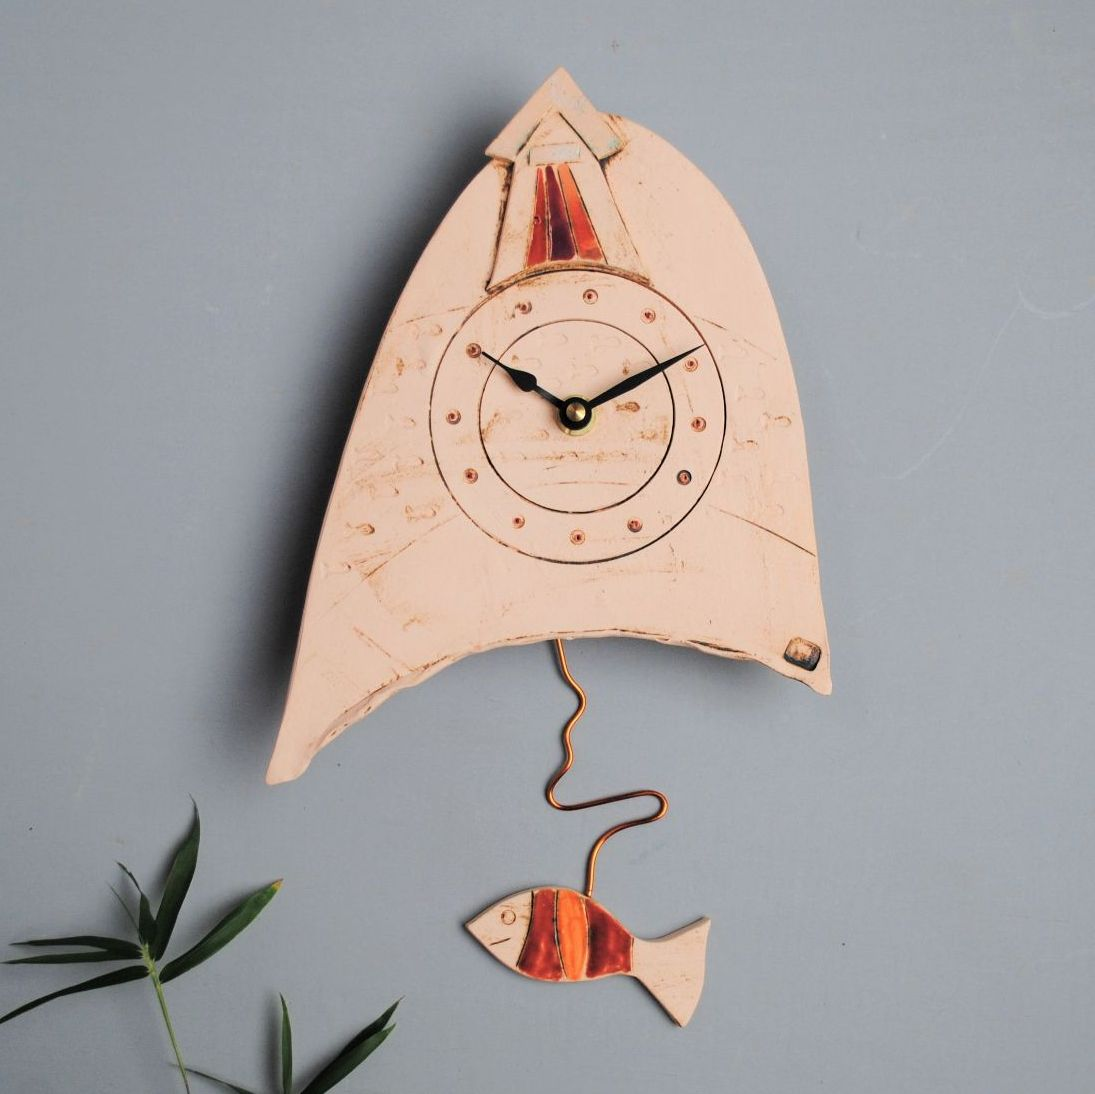 Ceramic pendulum wall clock with beach hut and fish.